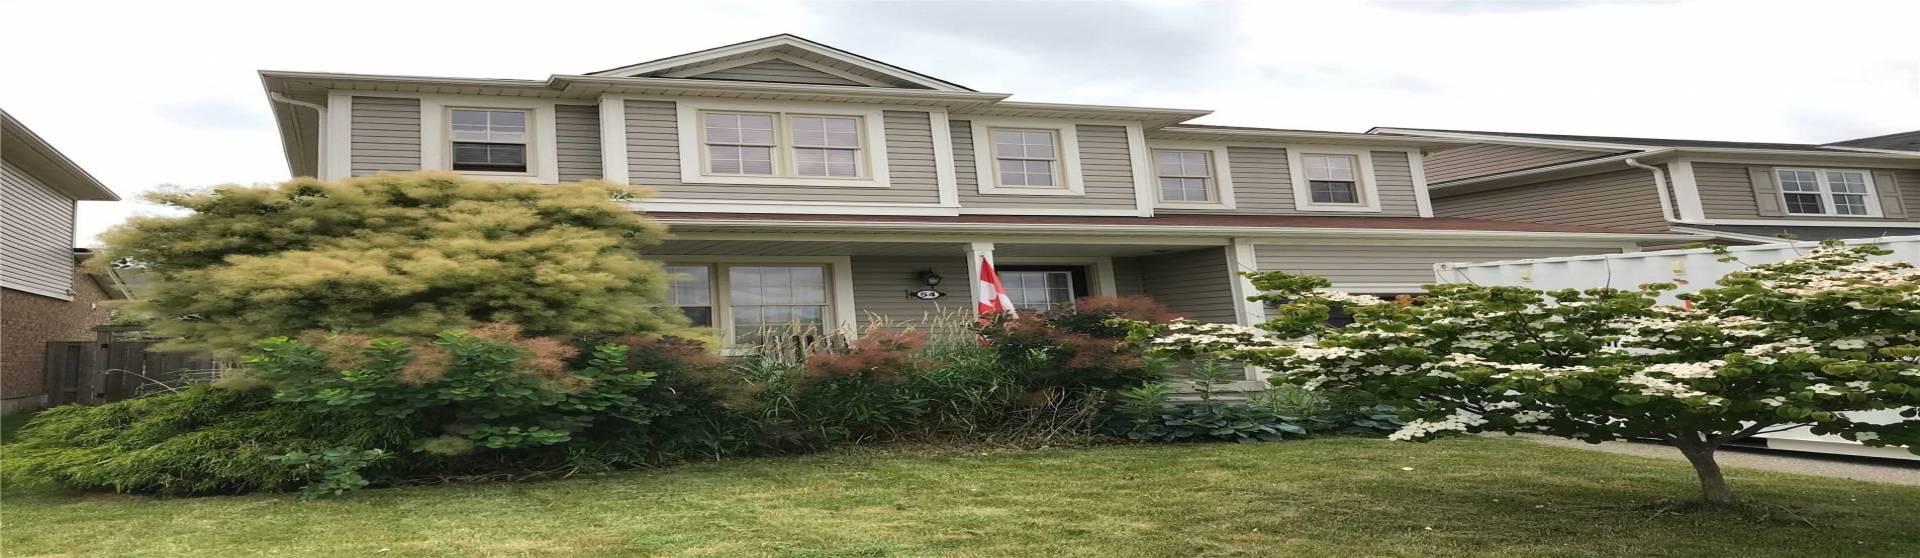 54 Avedisian St- Brantford- Ontario N3T0B7, 3 Bedrooms Bedrooms, 5 Rooms Rooms,3 BathroomsBathrooms,Detached,Sale,Avedisian,X4809277